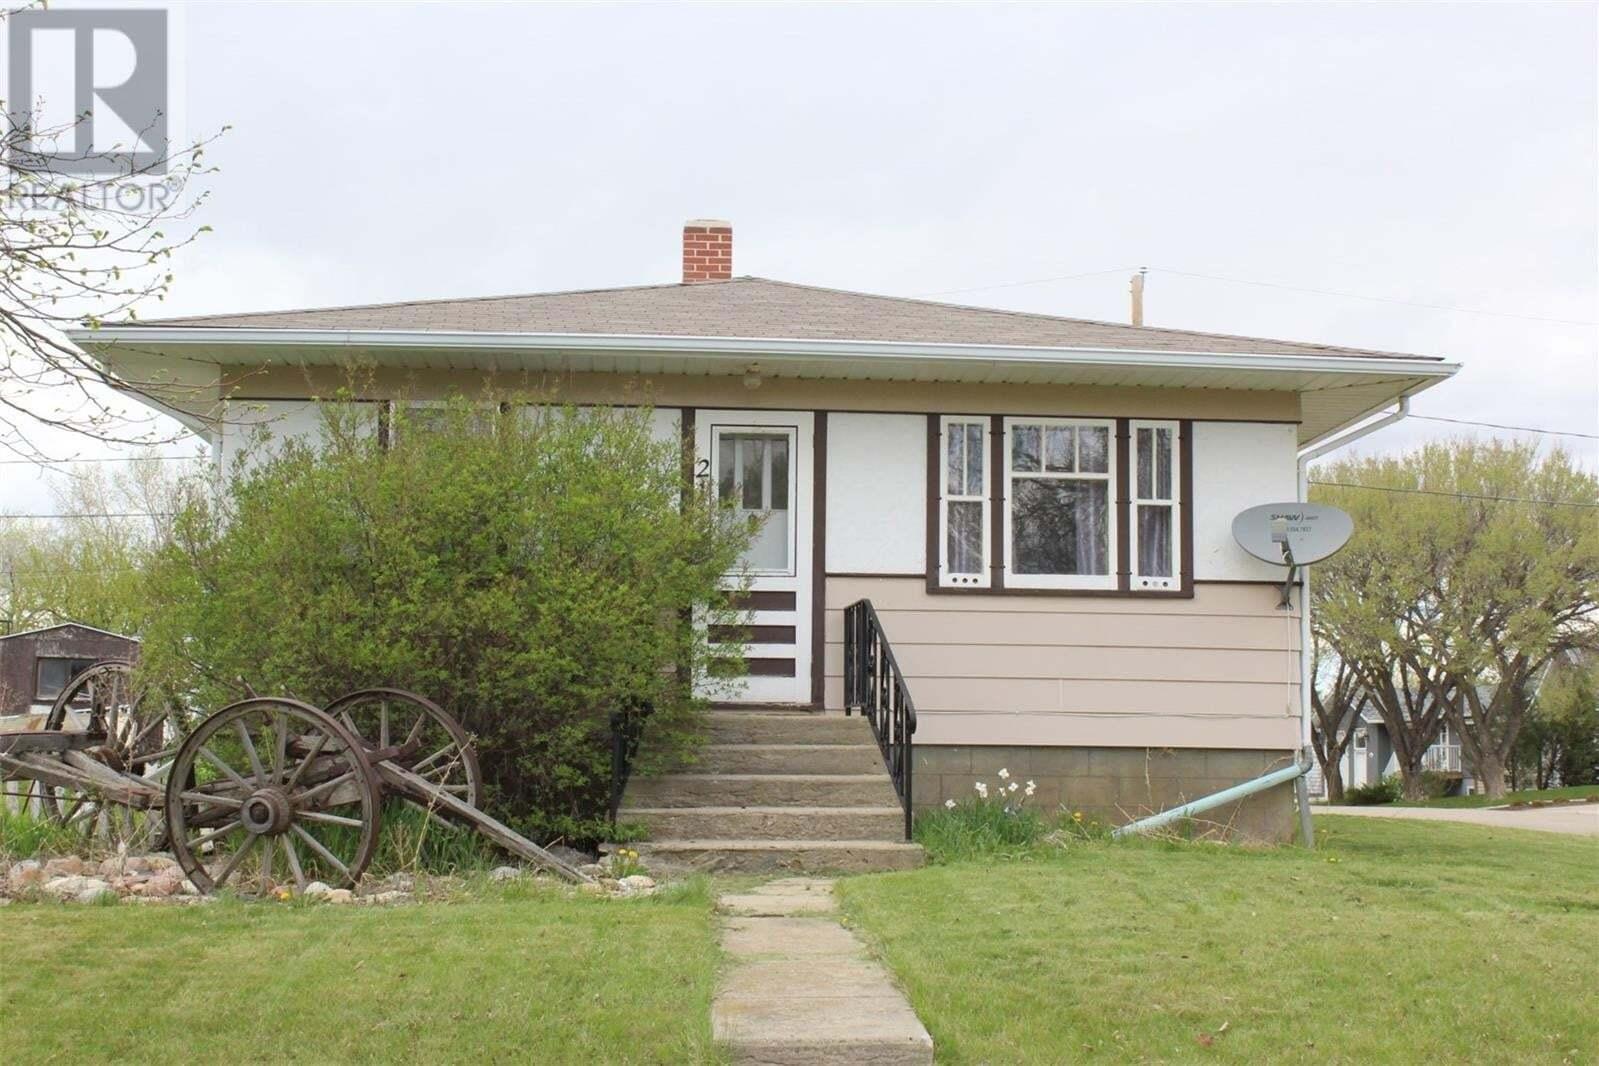 House for sale at 211 6th Ave W Shaunavon Saskatchewan - MLS: SK817502